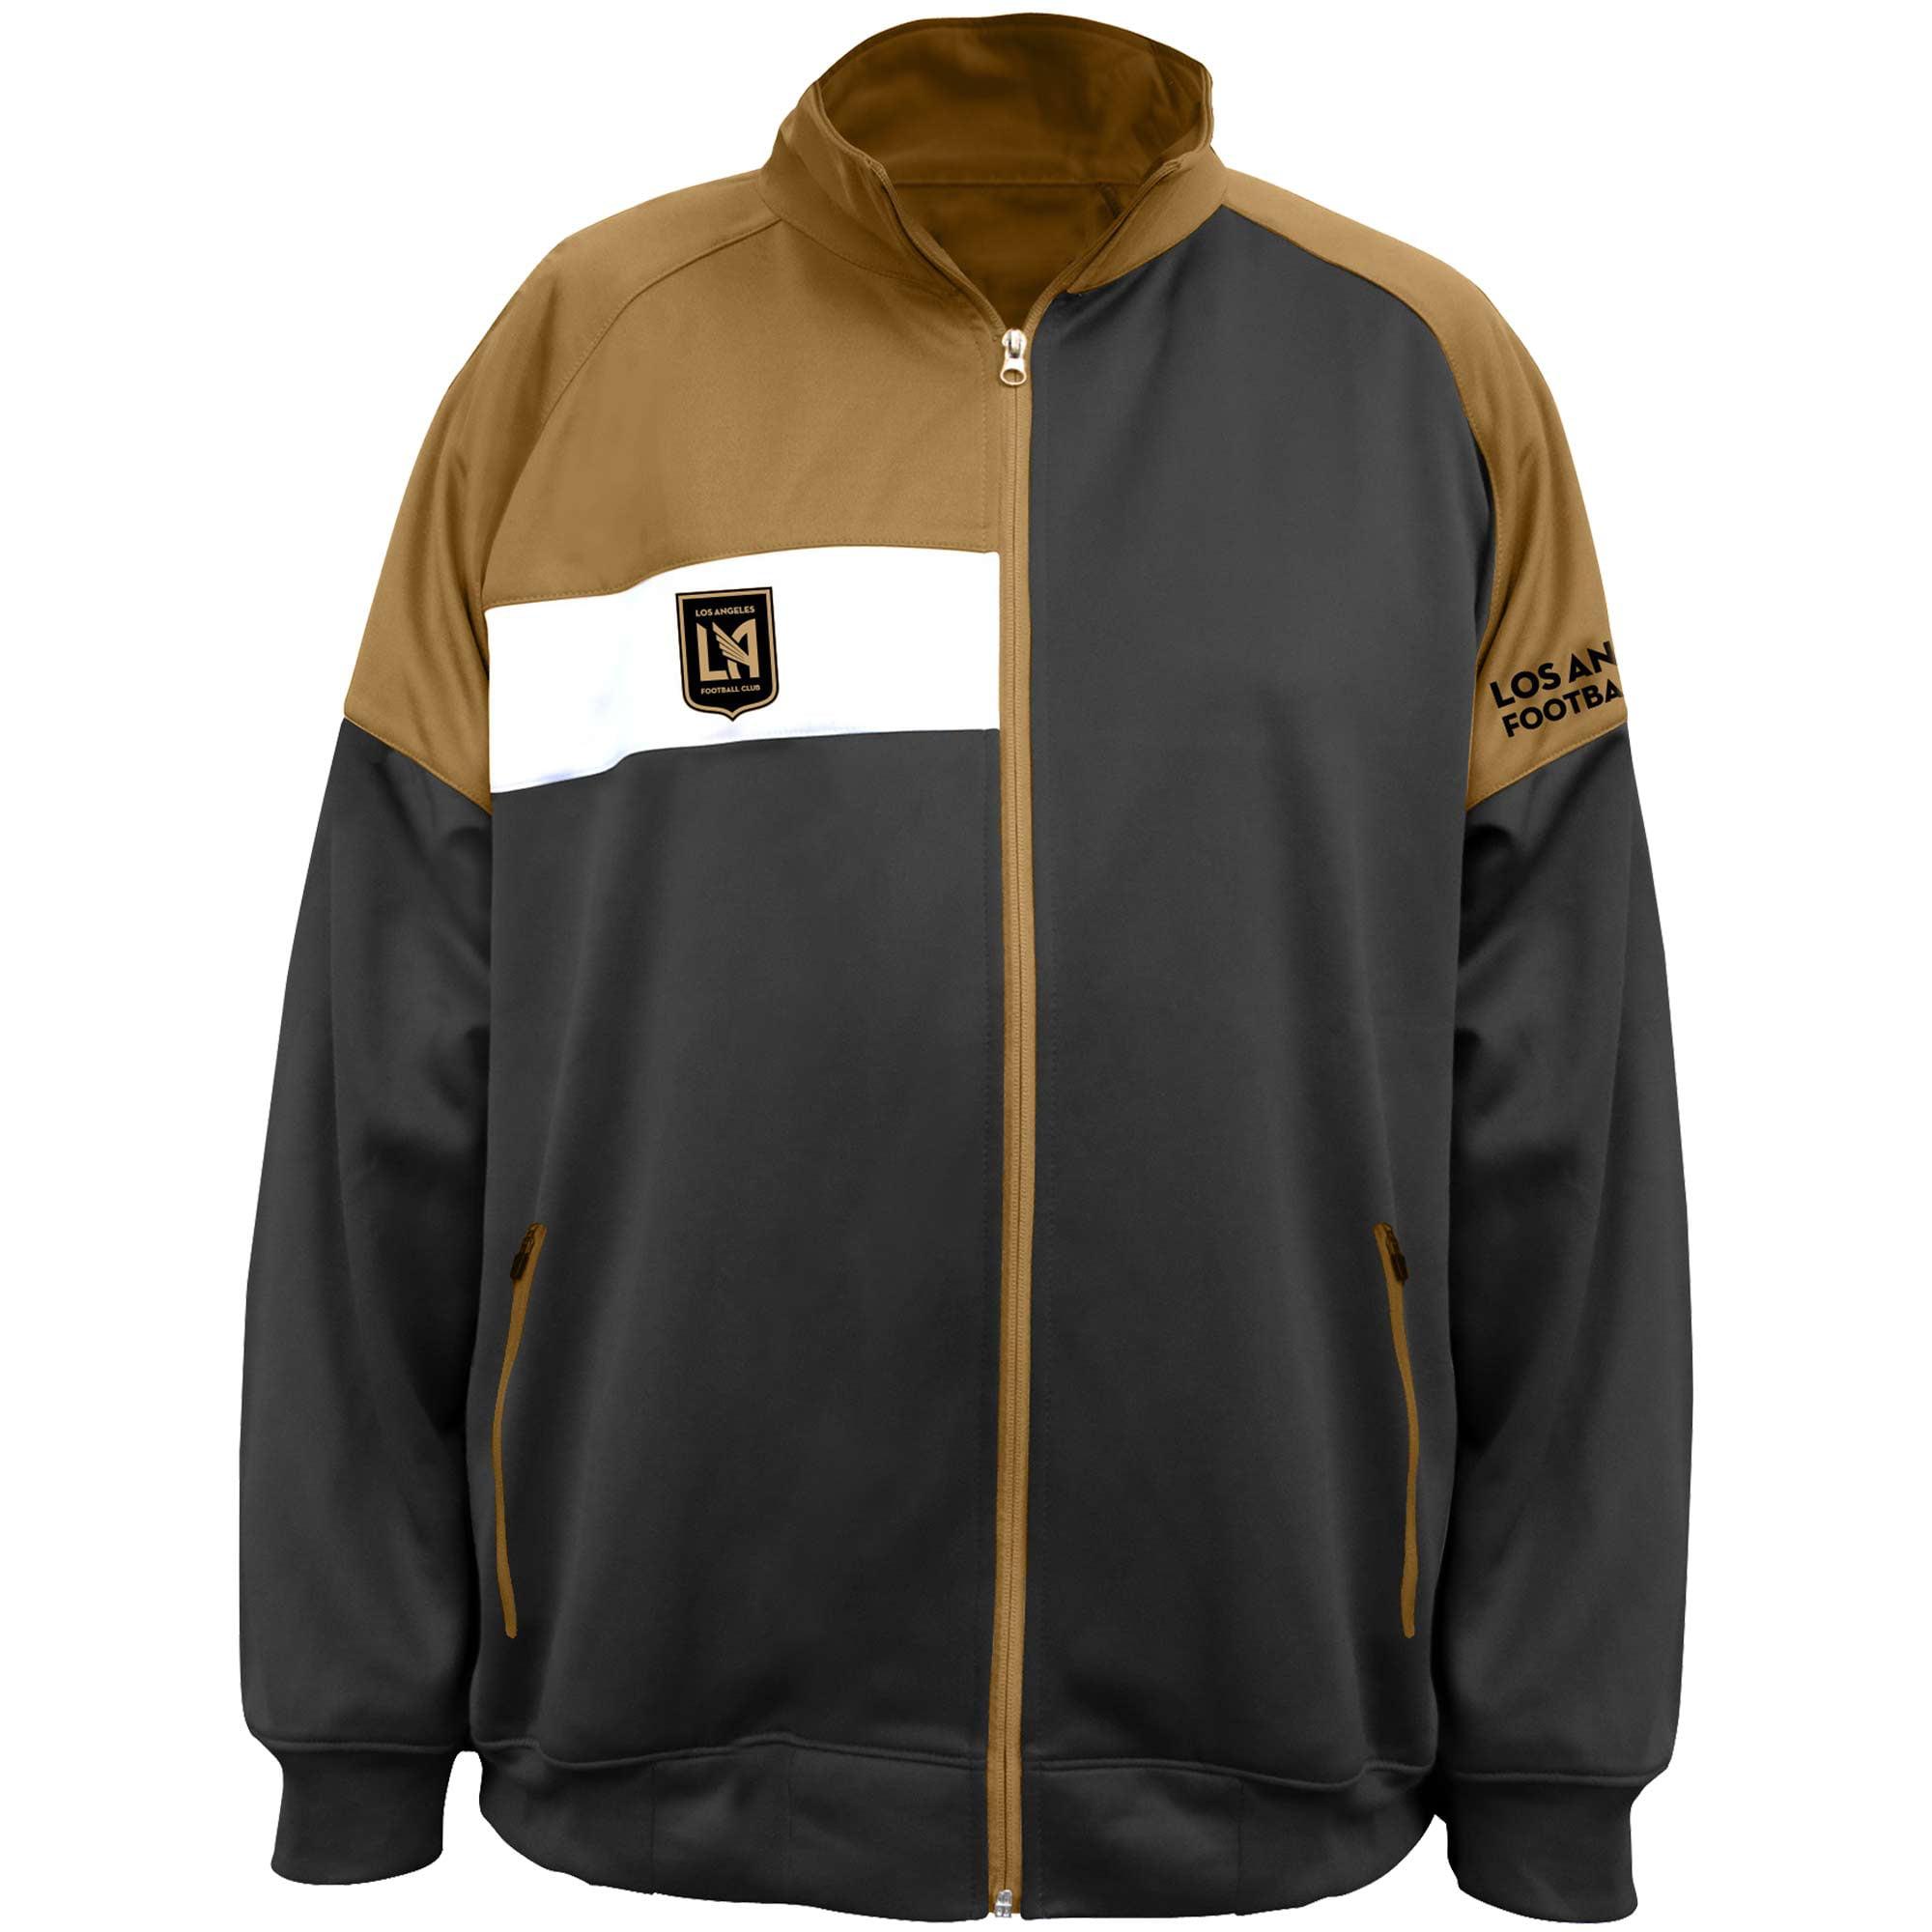 LAFC Majestic Big & Tall Poly Fleece Full-Zip Track Jacket - Black/Gold